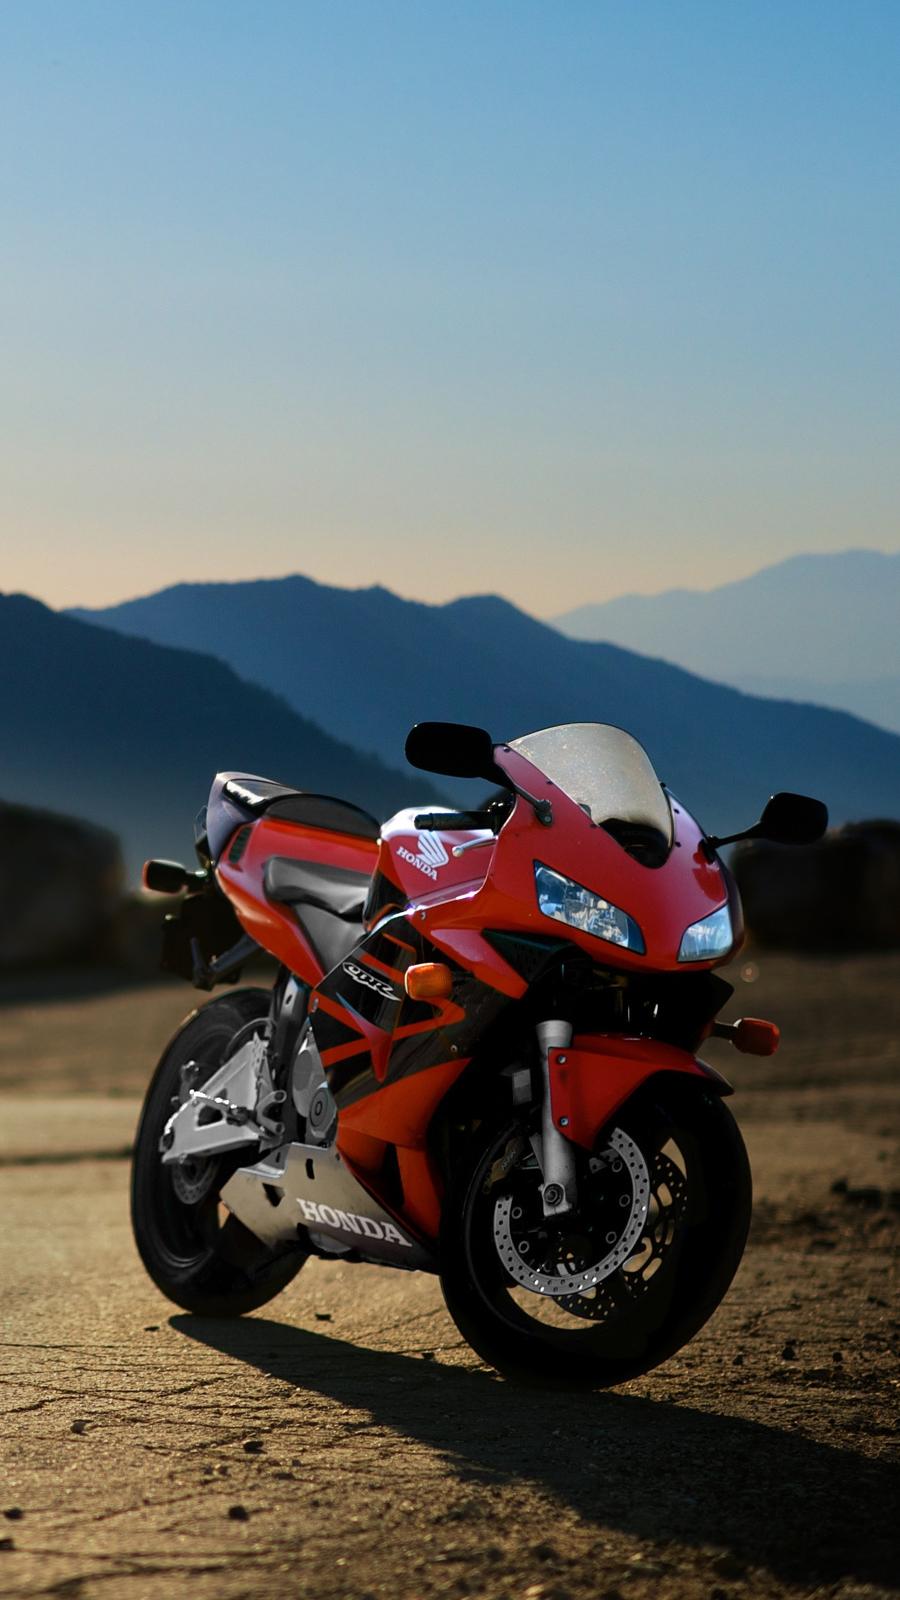 Honda CBR600rr Red Motorcycle iPhone Wallpaper iphoneswallpapers com